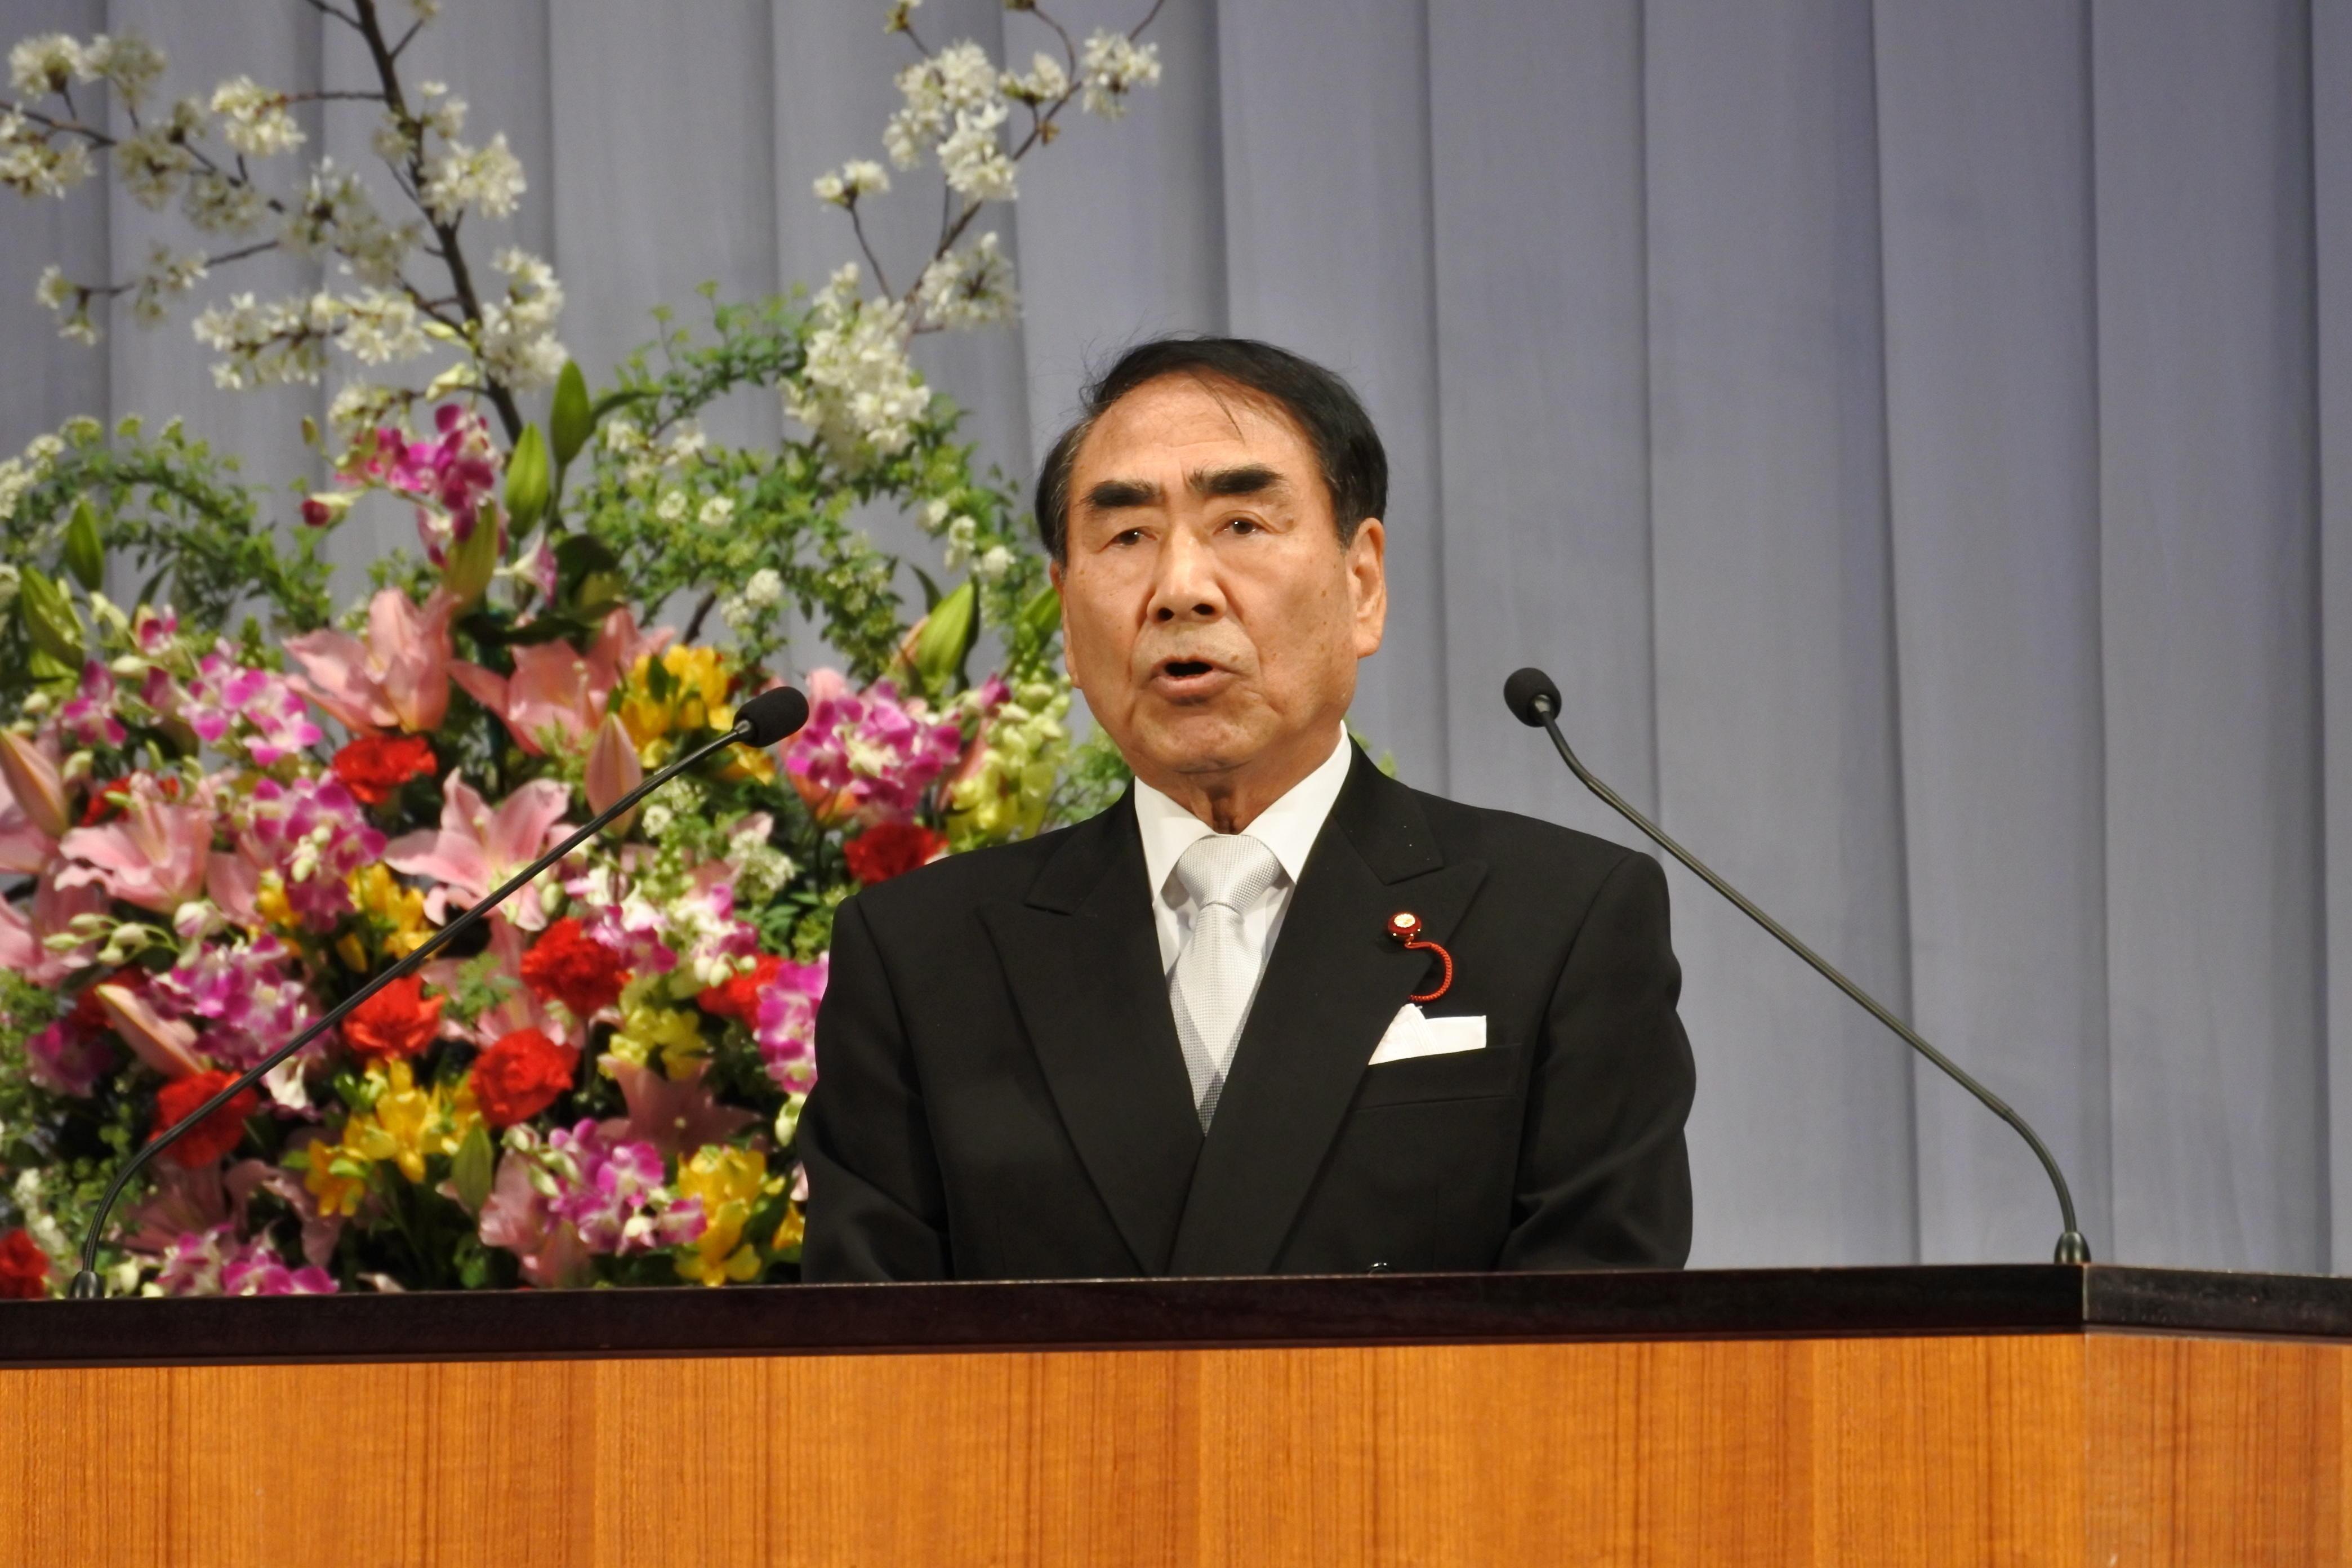 祝辞を贈る山田弥一校友会会長